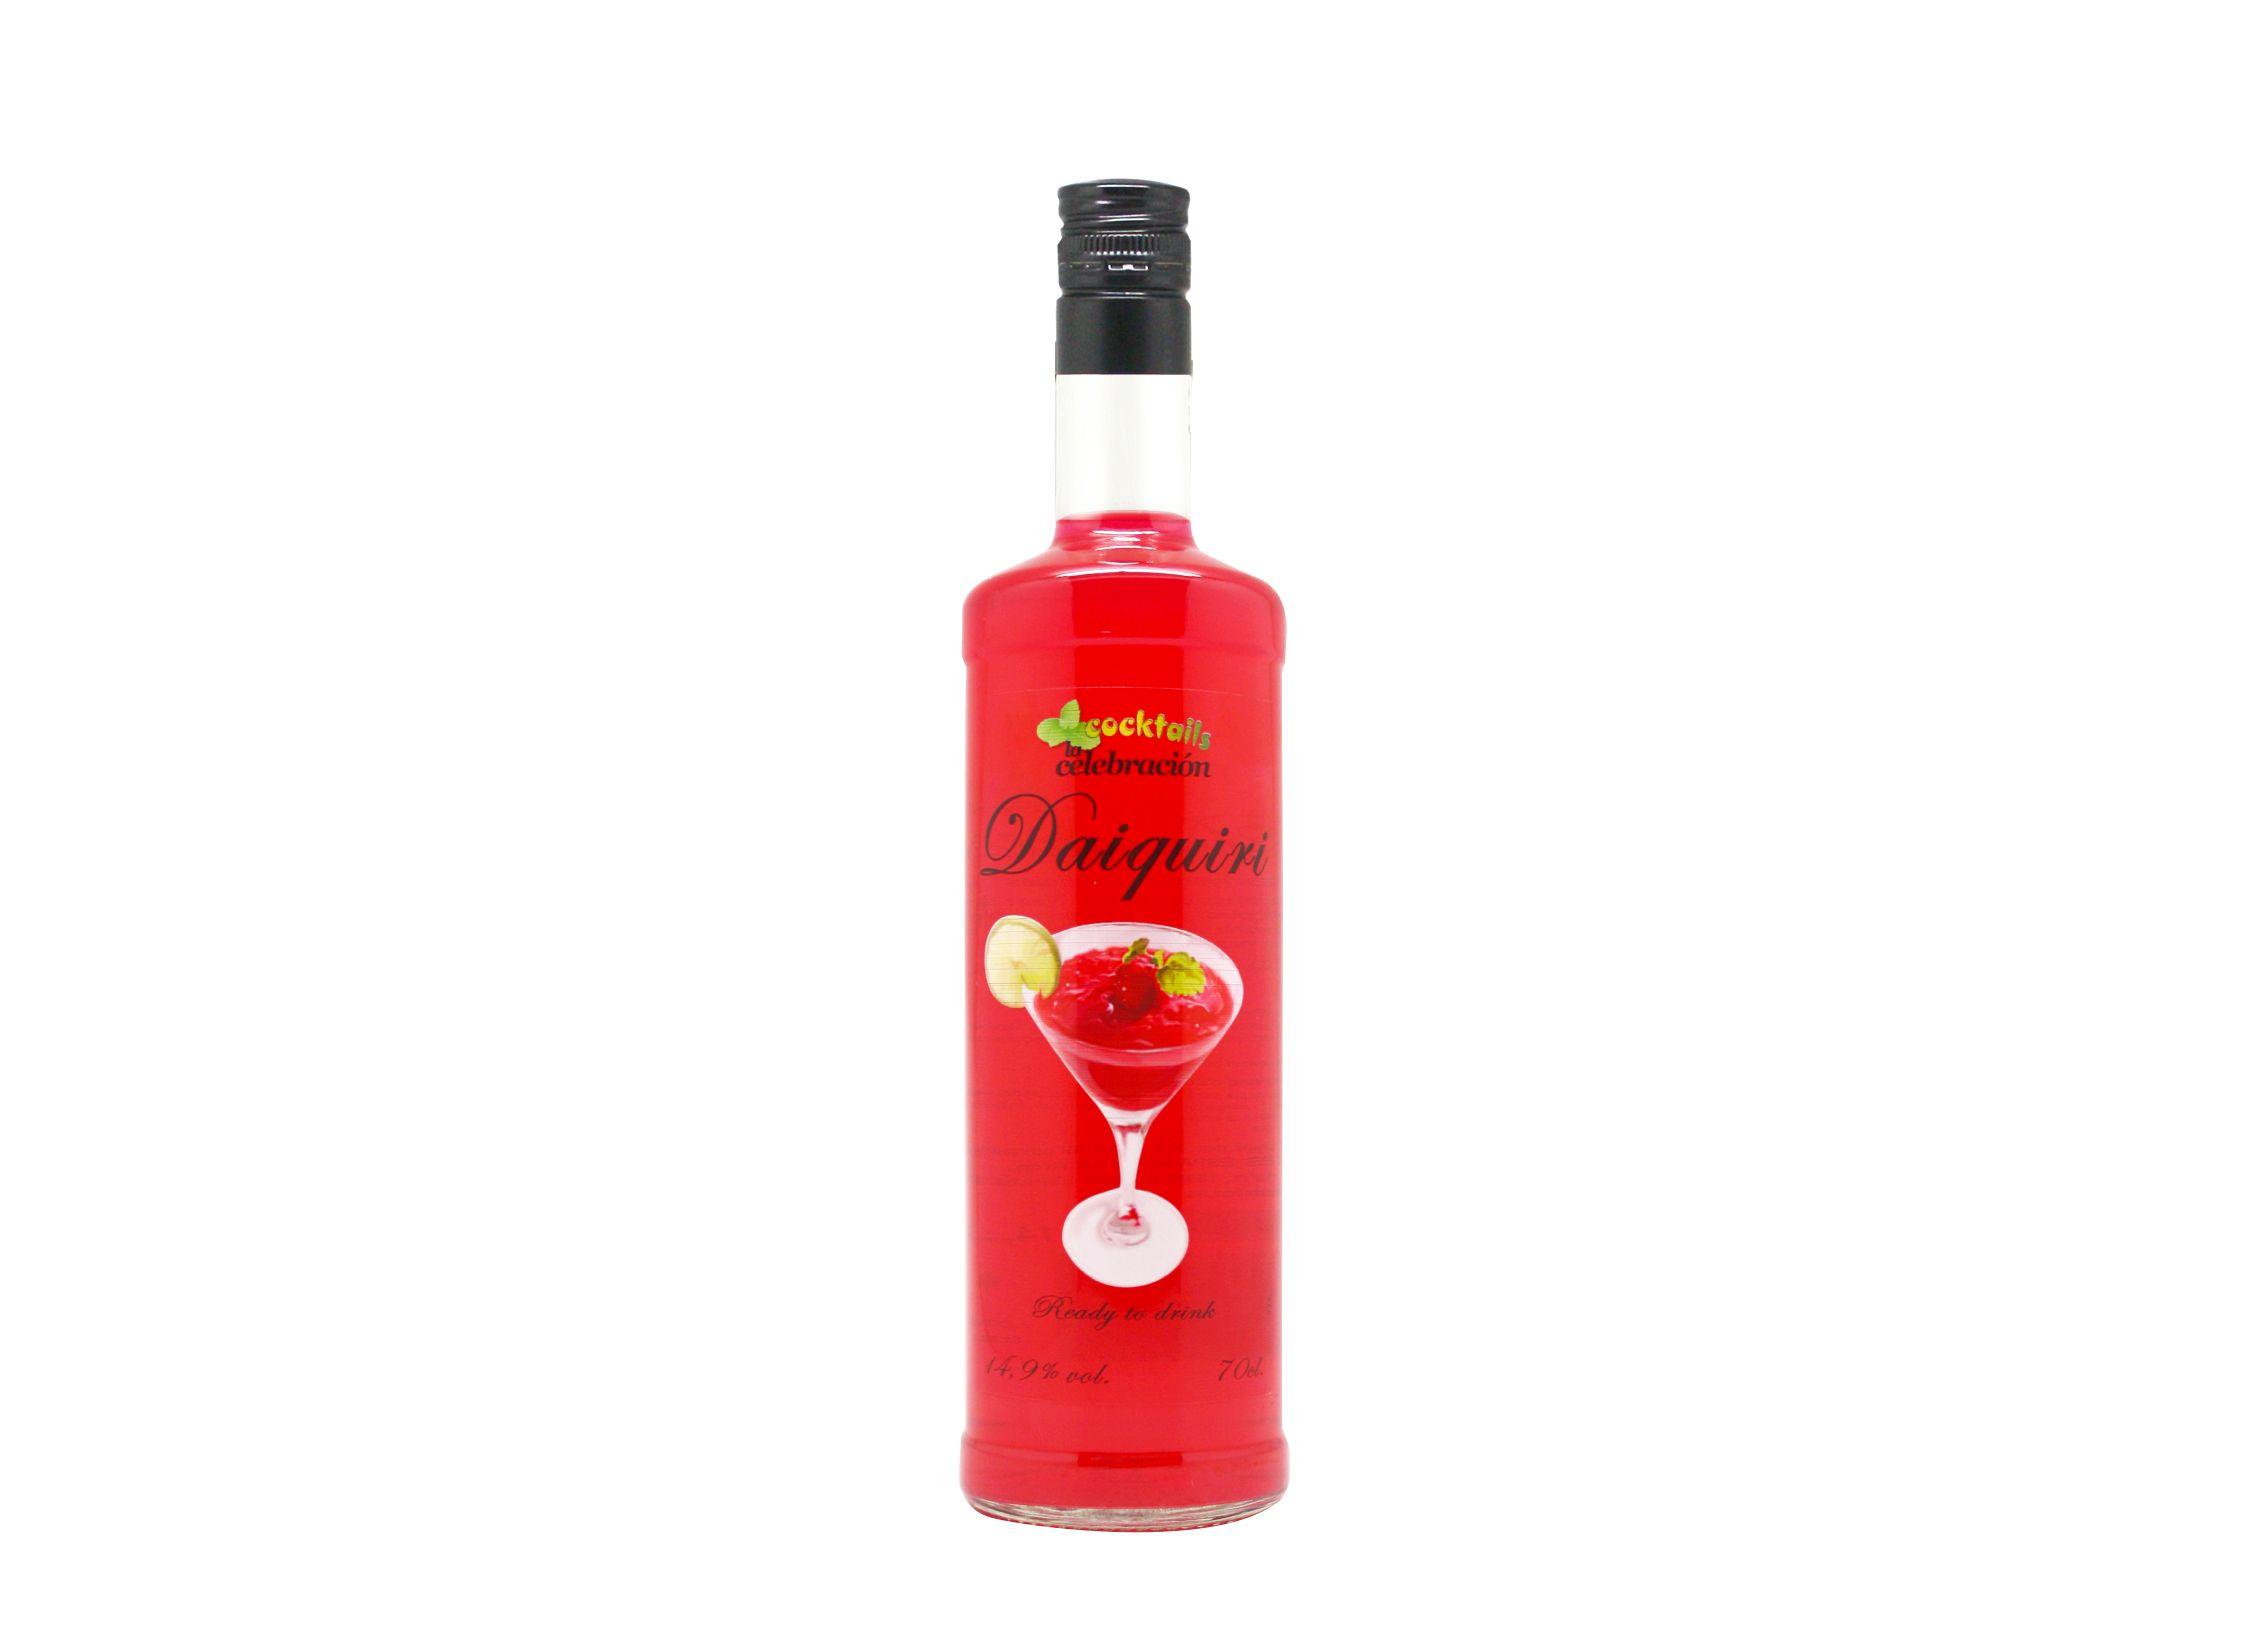 bebida de cocktail daiquiri botella con alcohol, en tamaño de 70cl con 14,9 grados de alcohol ya preparada lista para tomar.